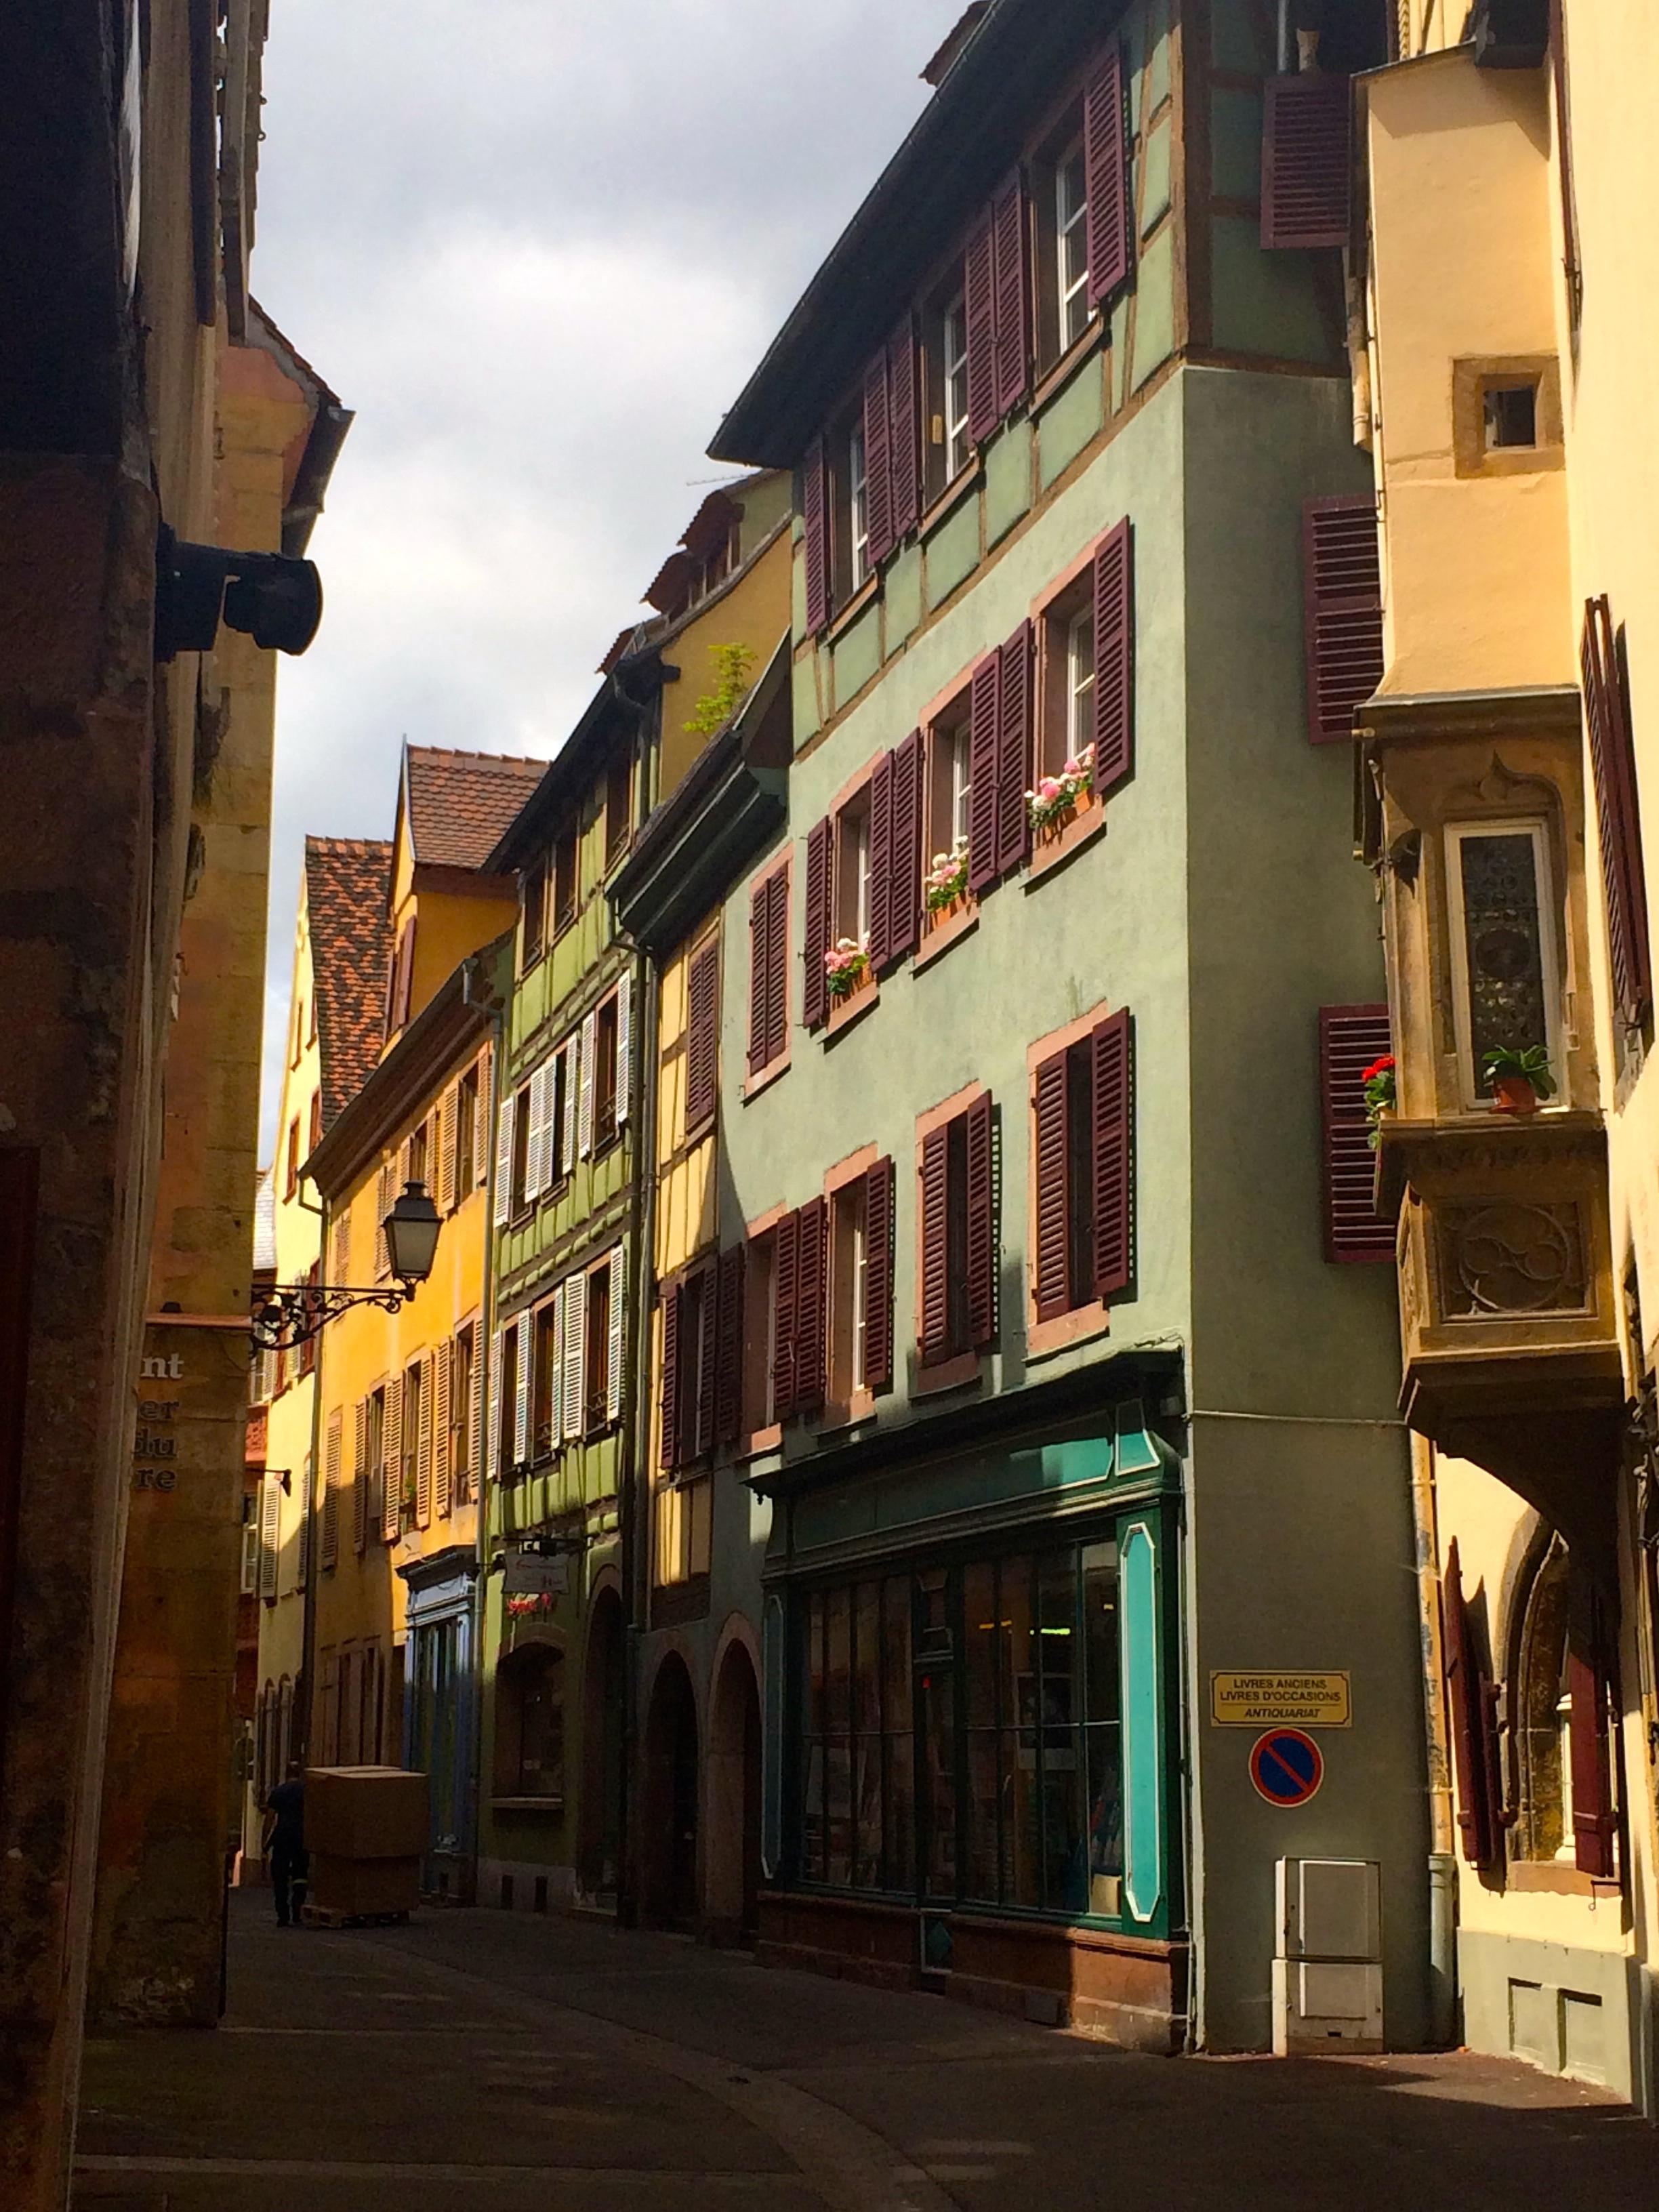 Beautiful street in Colmar